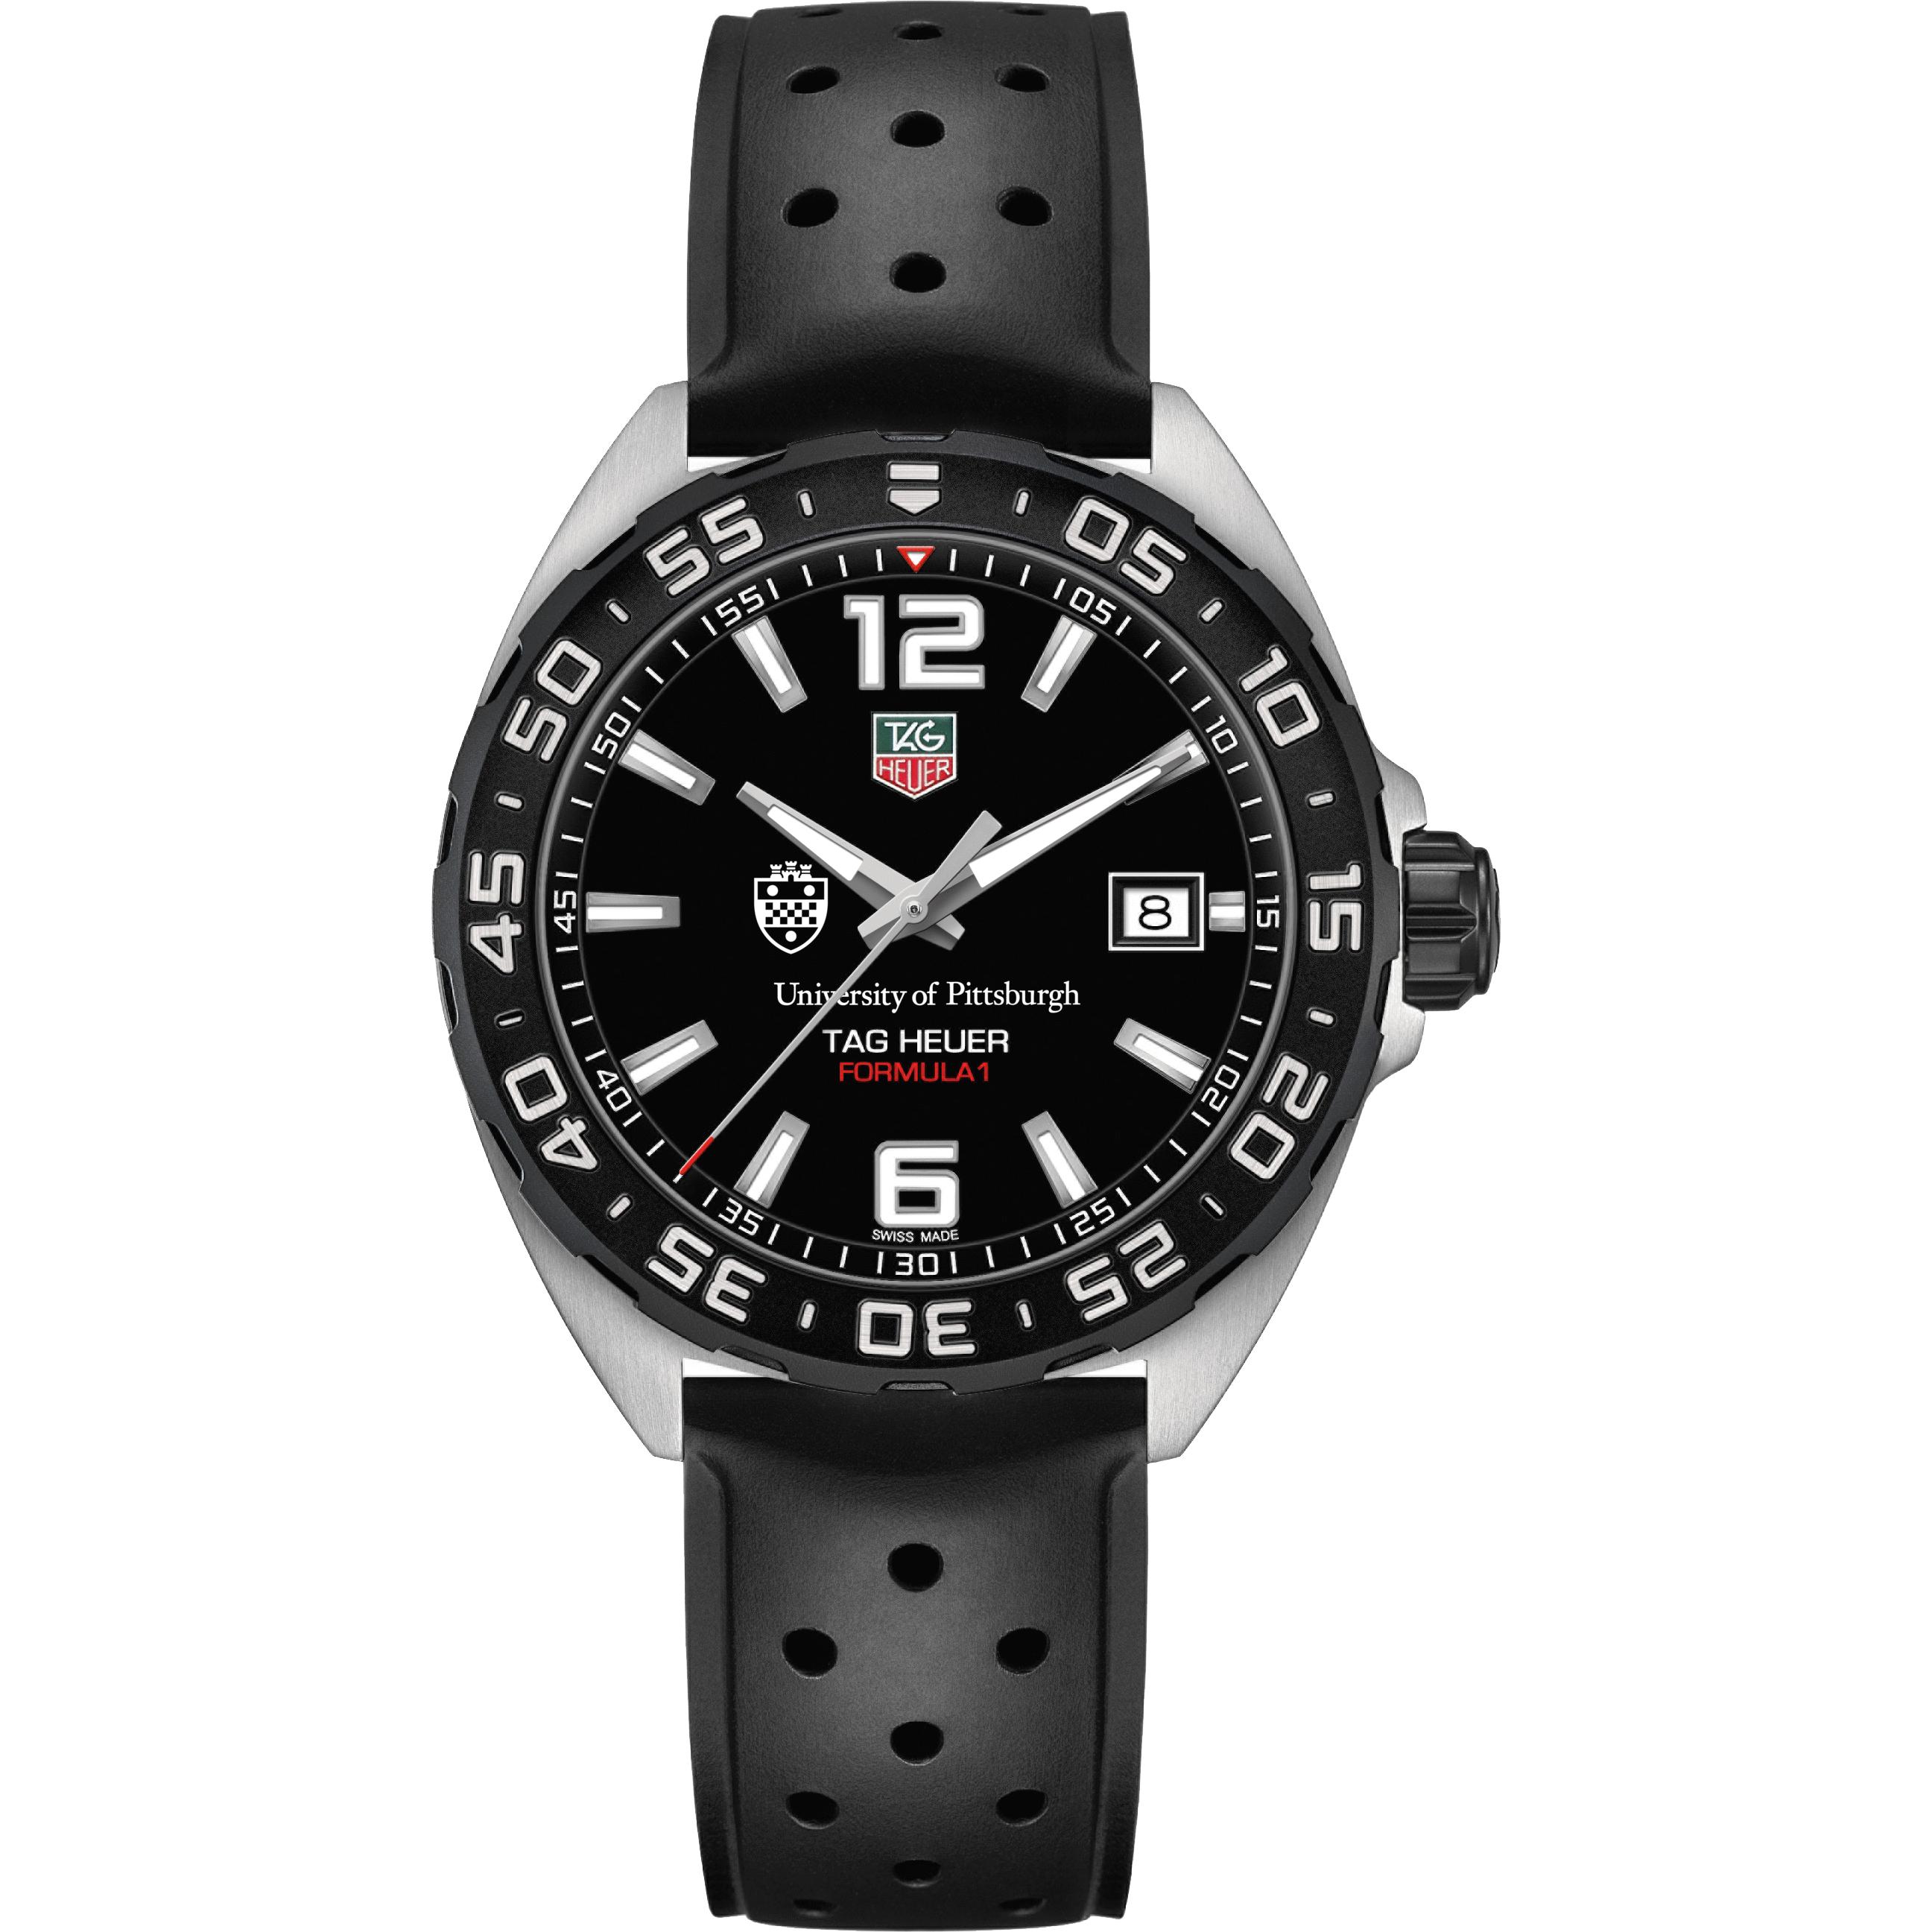 Pitt Men's TAG Heuer Formula 1 with Black Dial